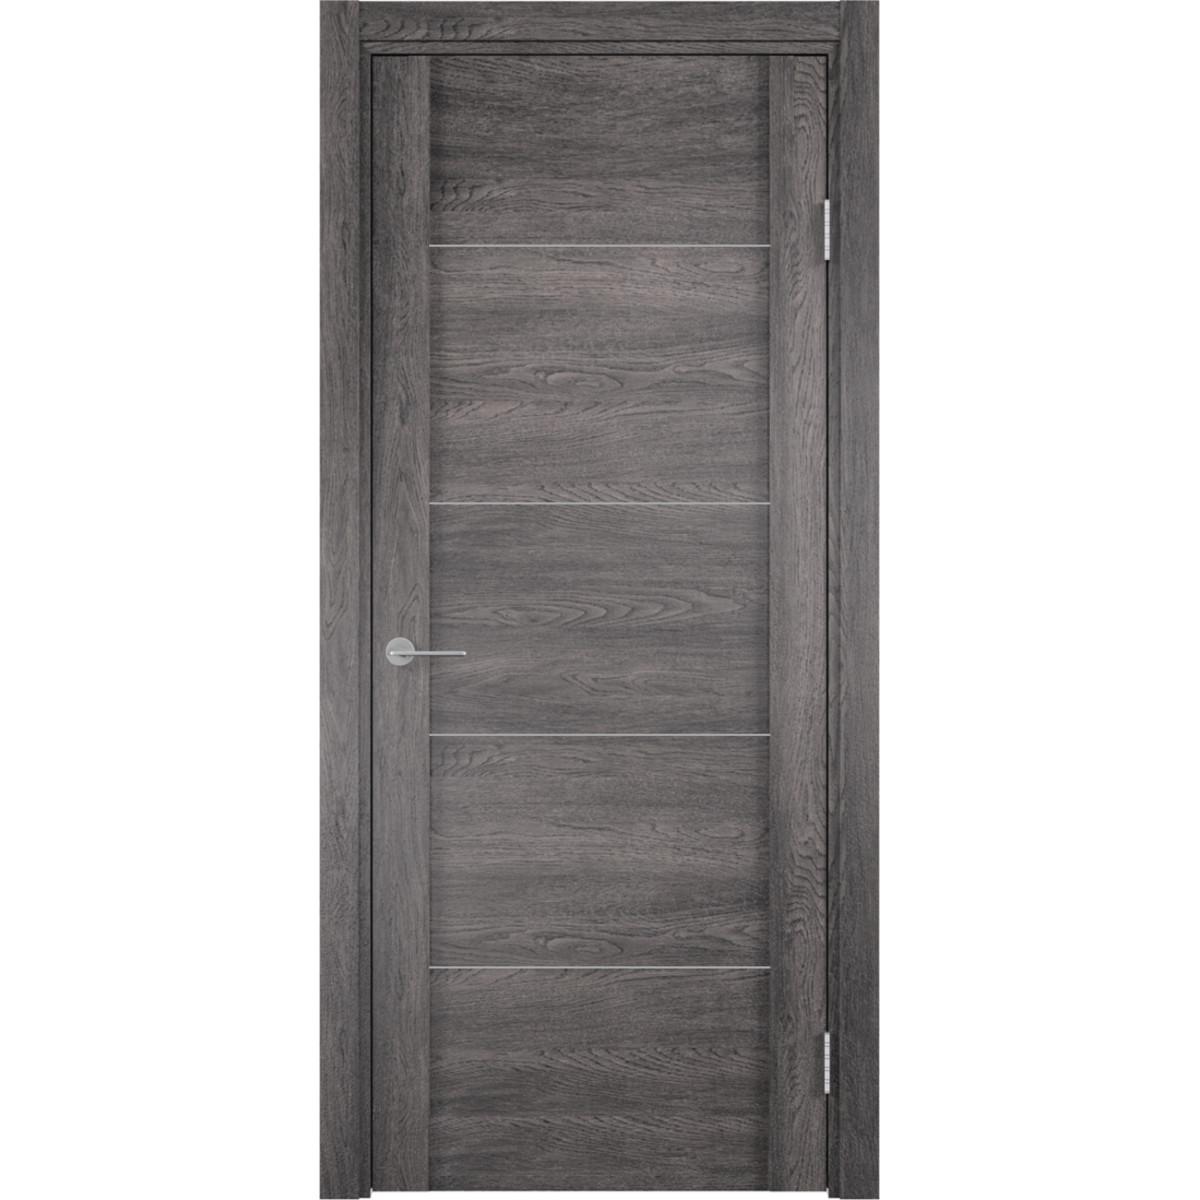 Дверь Межкомнатная Глухая С Замком В Комплекте Квадро 200x70 Пвх Цвет Шале Серый